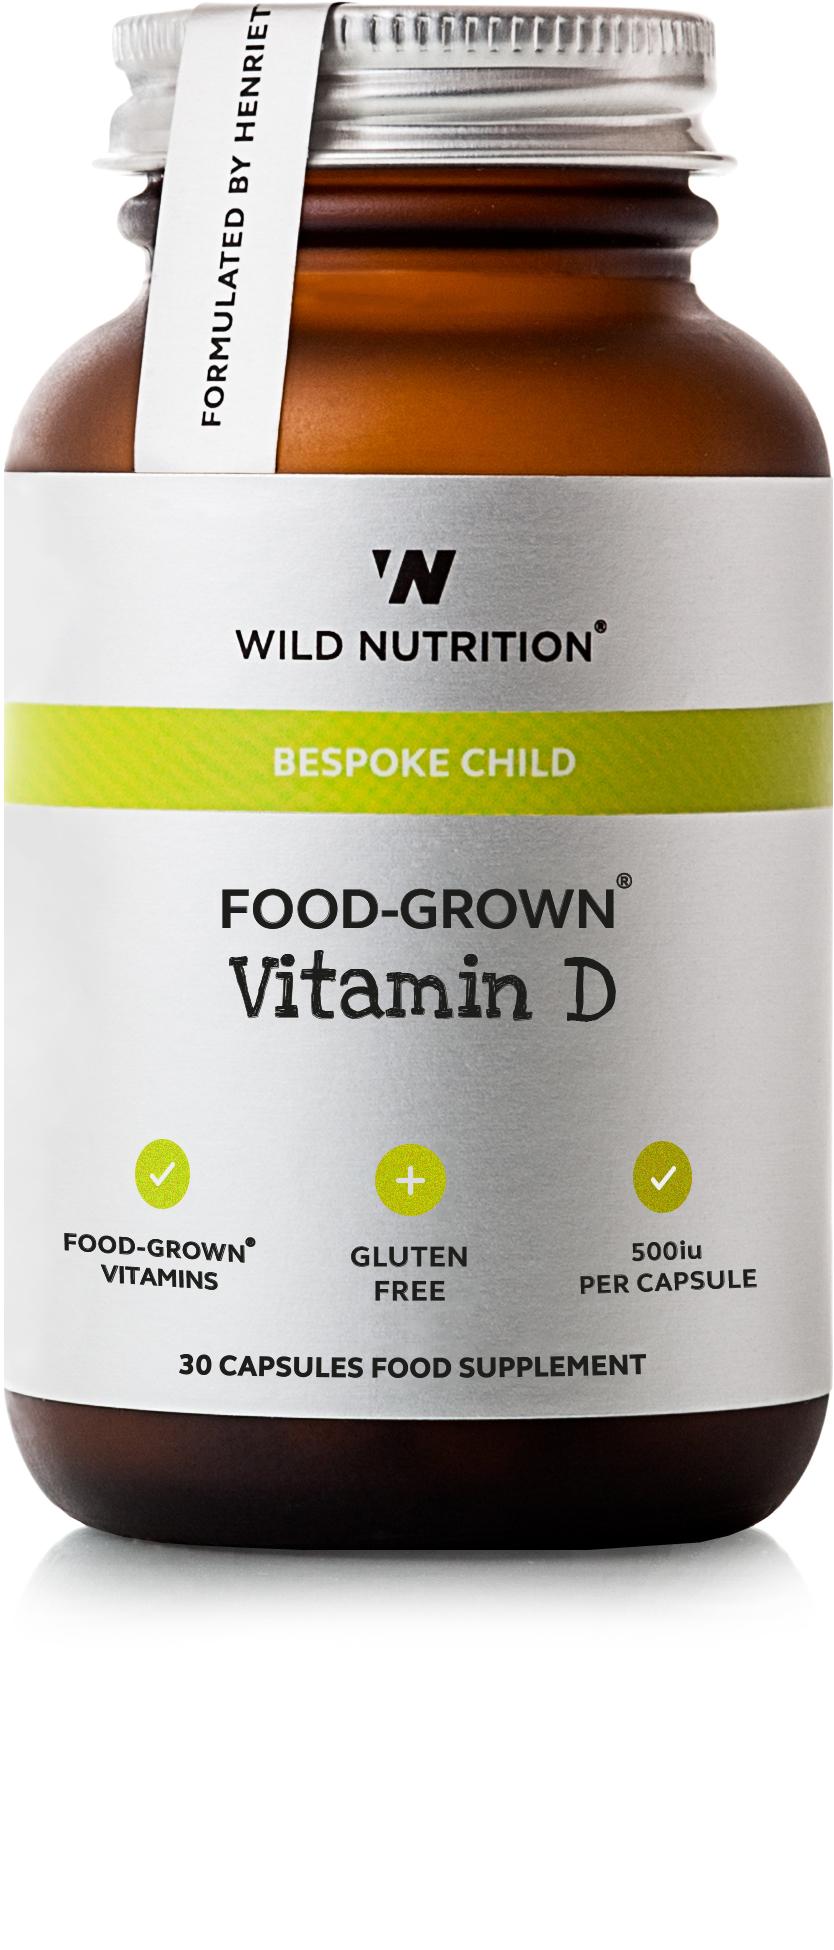 Bespoke Child Food-Grown Vitamin D 30's